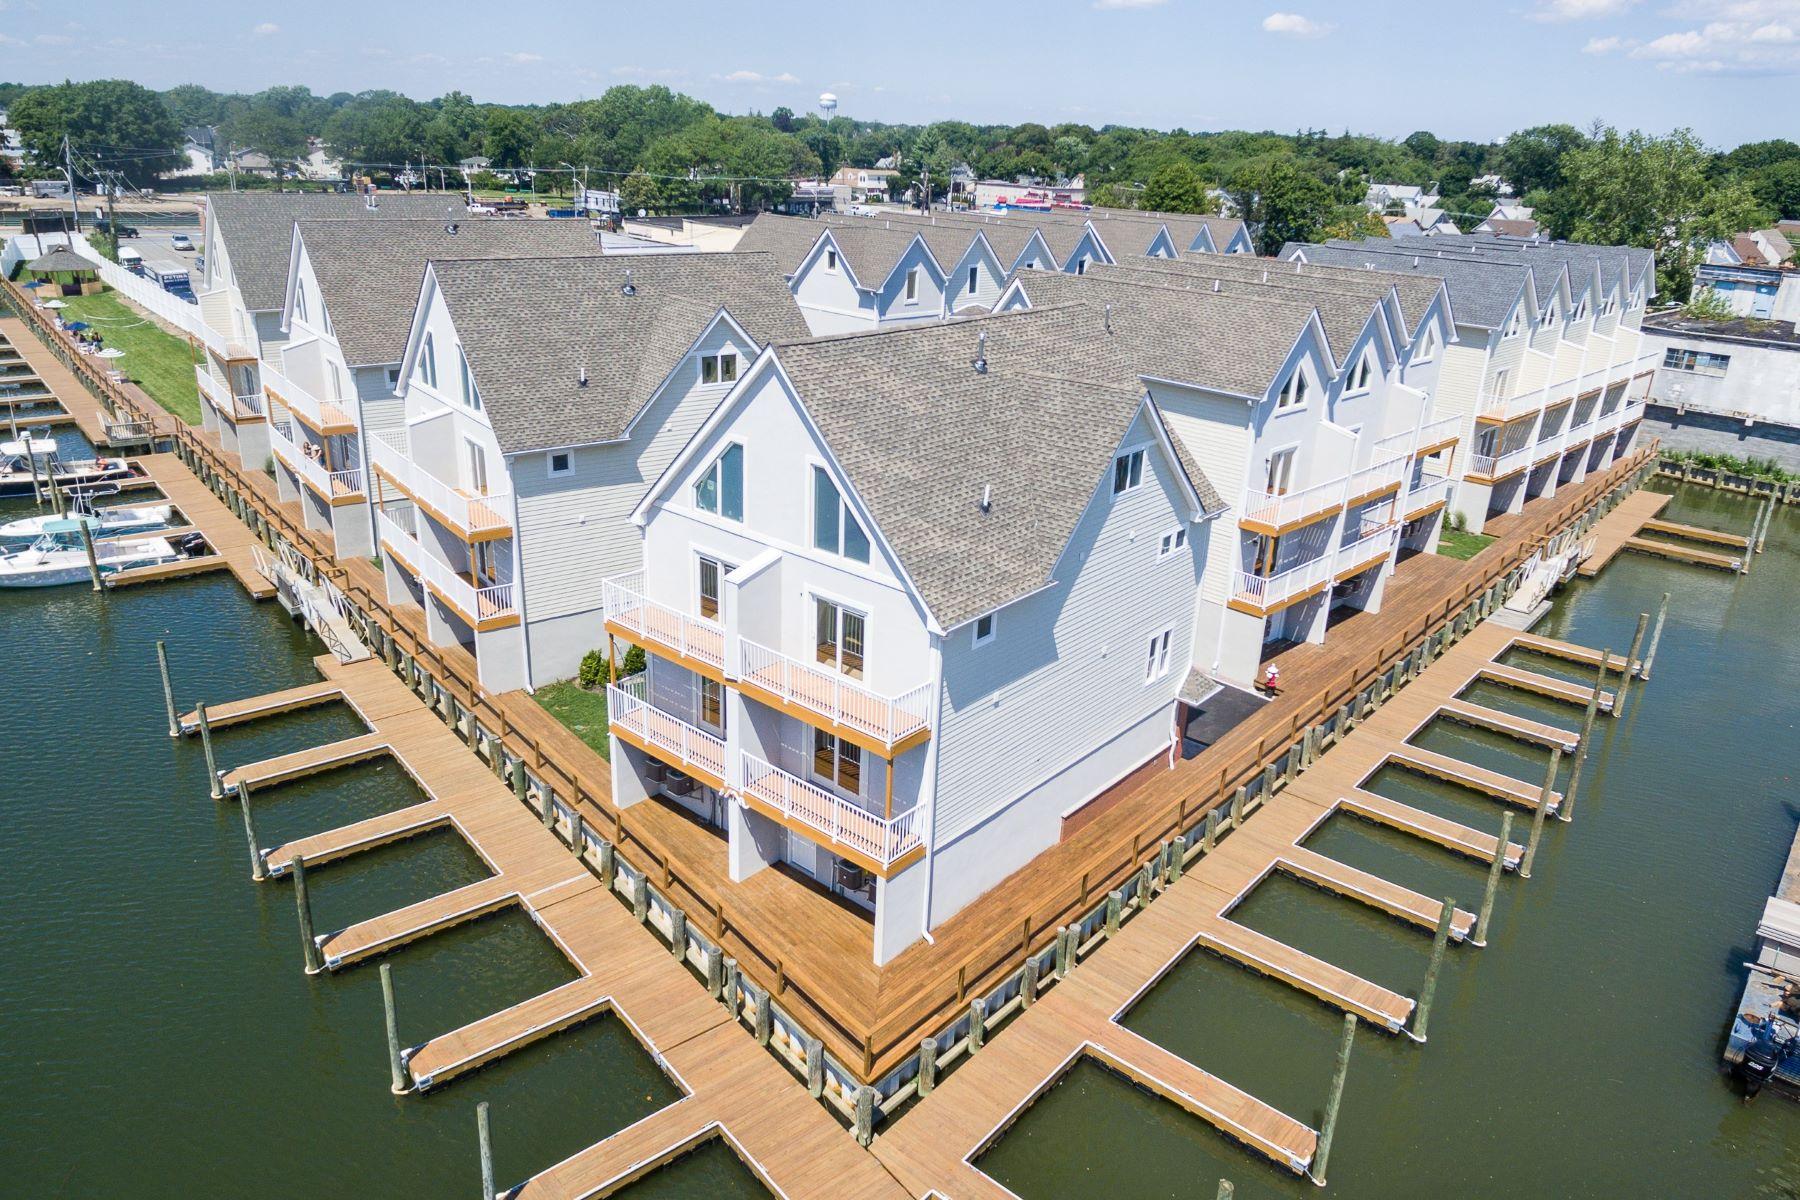 Condominium for Sale at Condo 600 Ray St 22 Freeport, New York 11520 United States